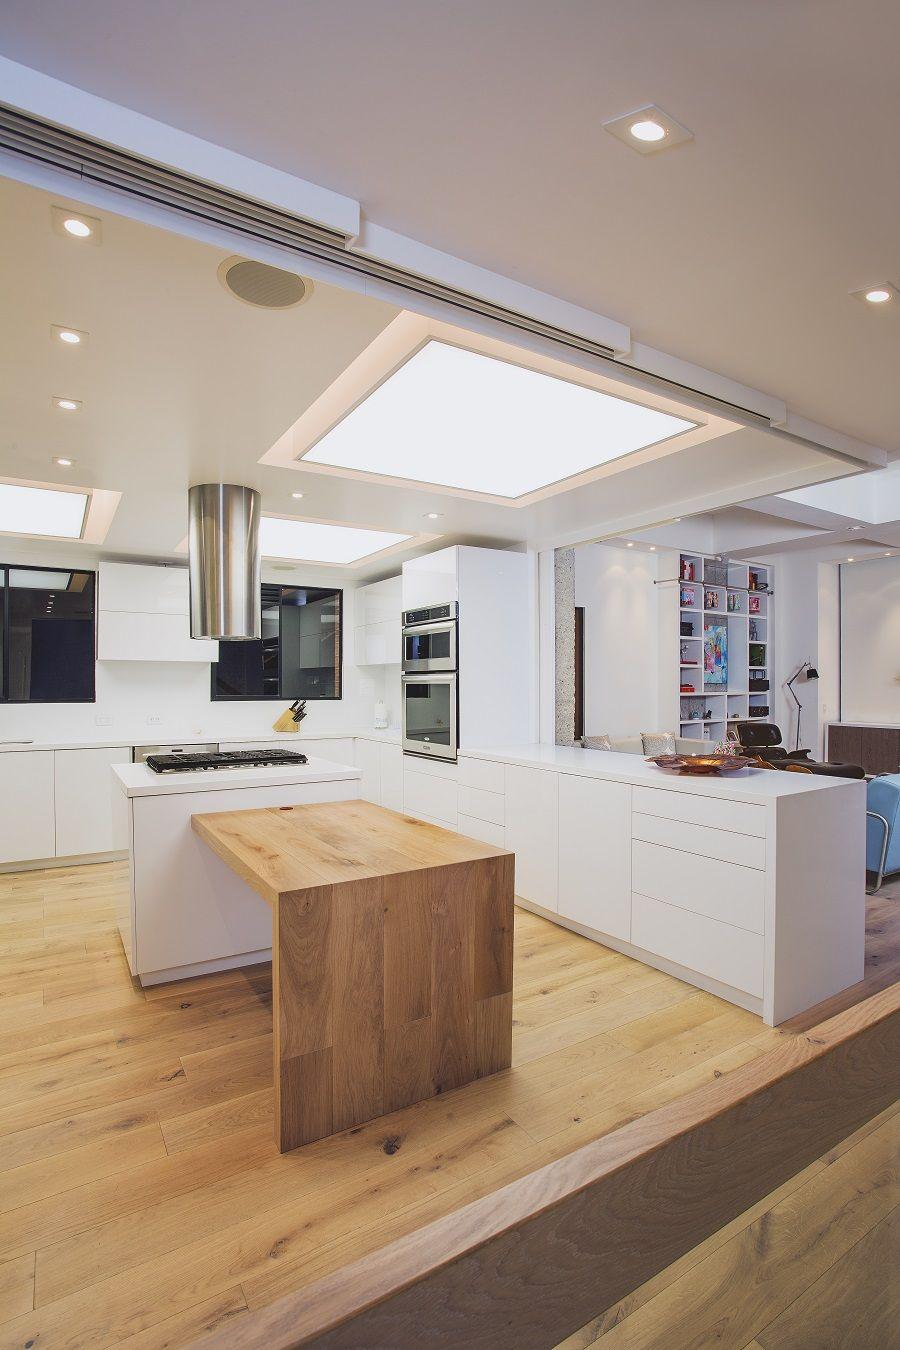 3 consejos para iluminar correctamente tu cocina l mparas - Focos para cocina ...